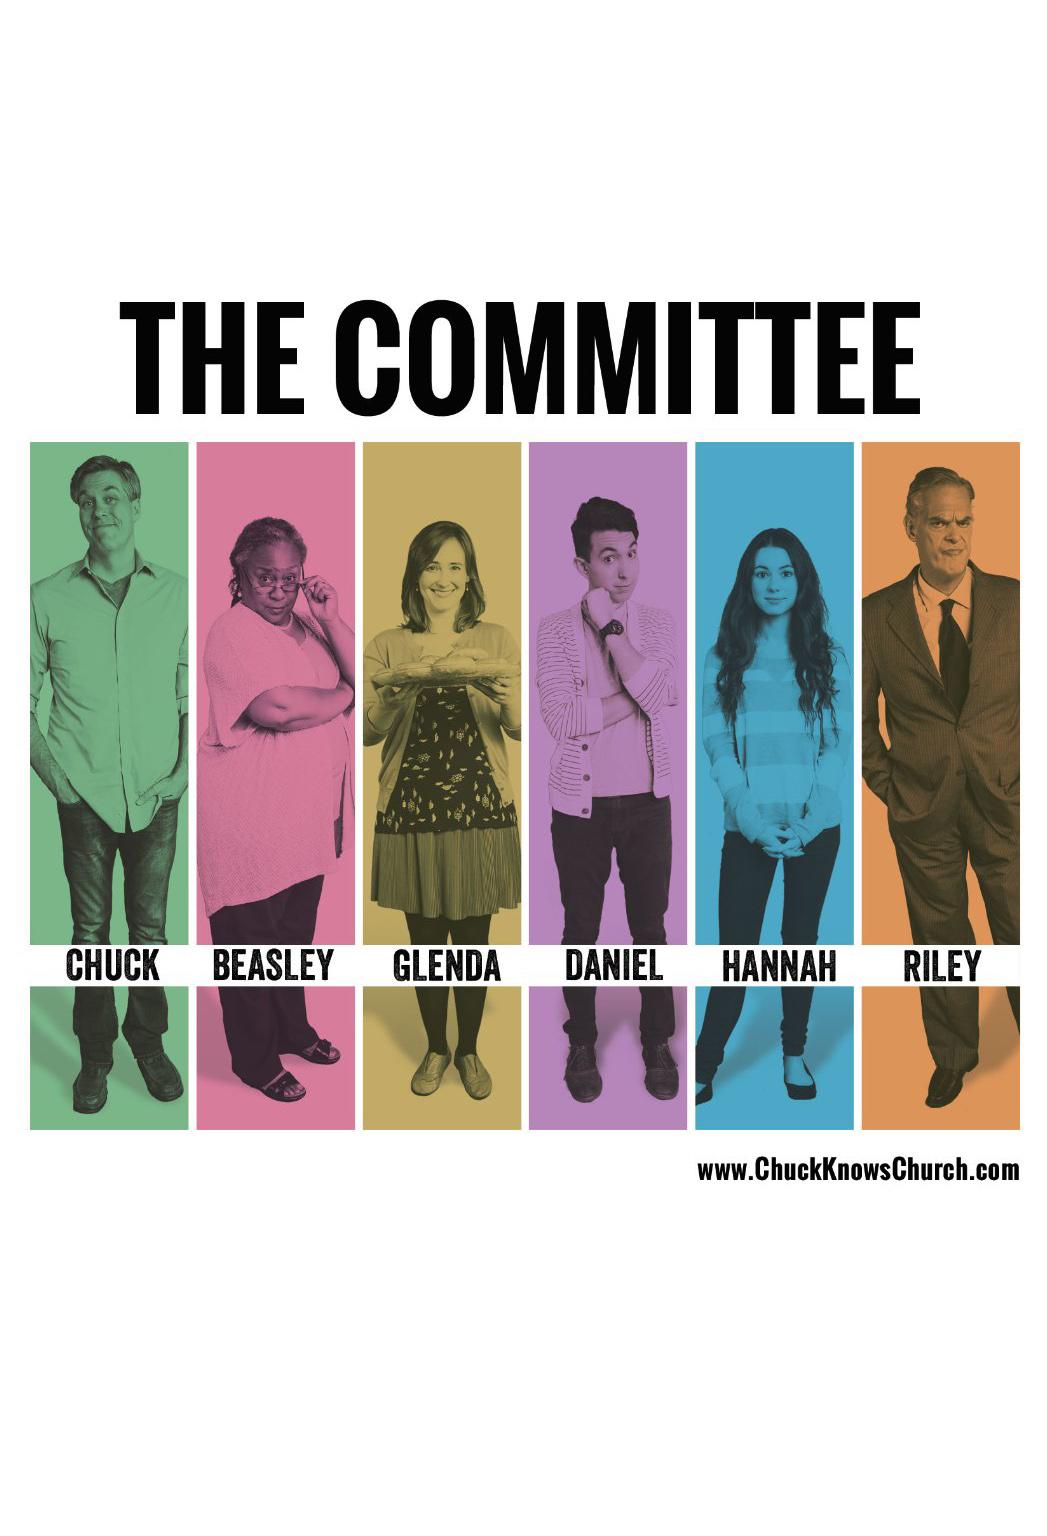 The Committee (TV Series 2015– ) - IMDb